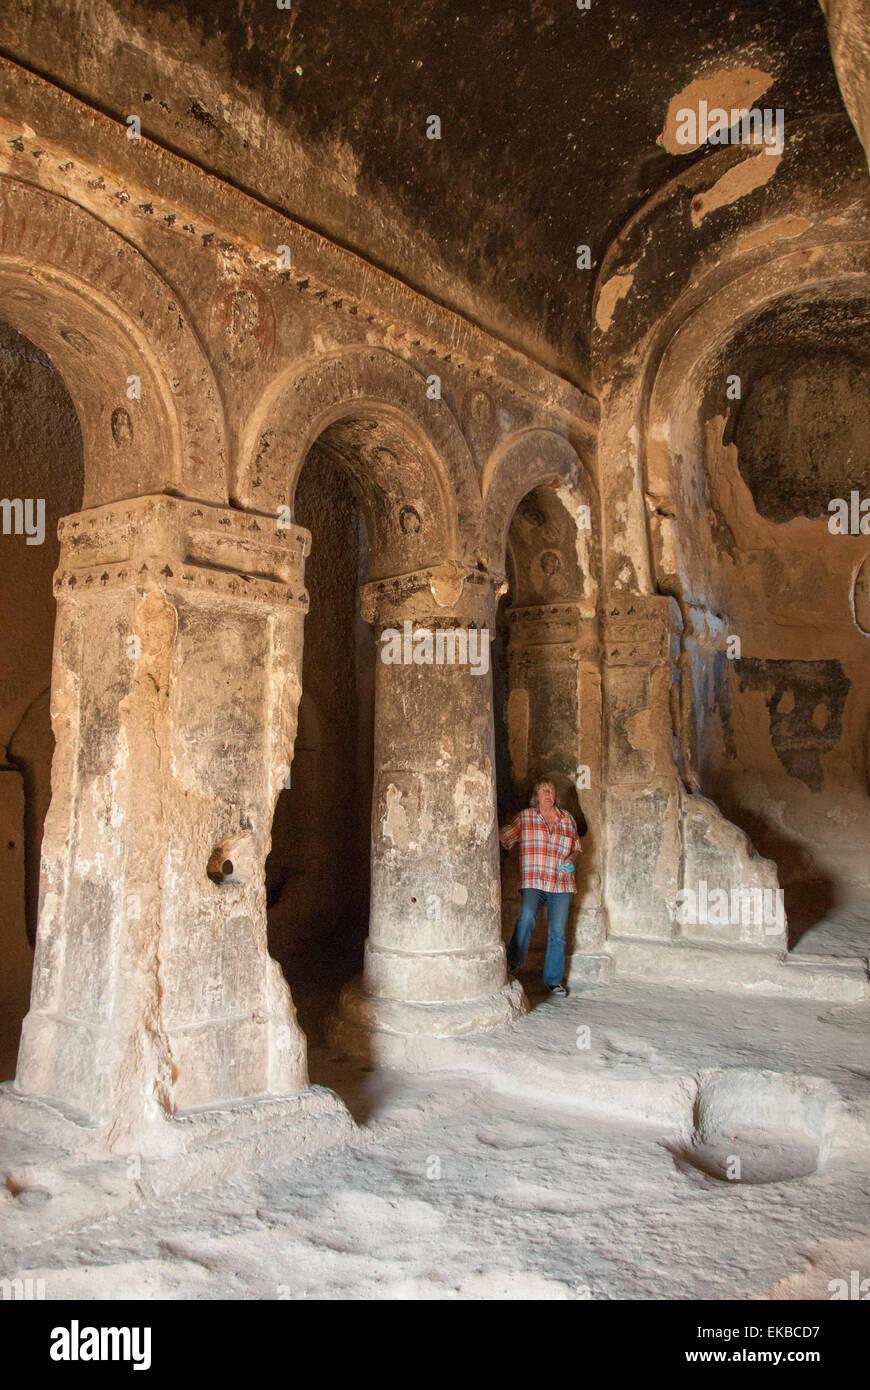 Selime, Ihlara, westlichen Kappadokien, Anatolien, Türkei, Kleinasien, Eurasien Stockbild